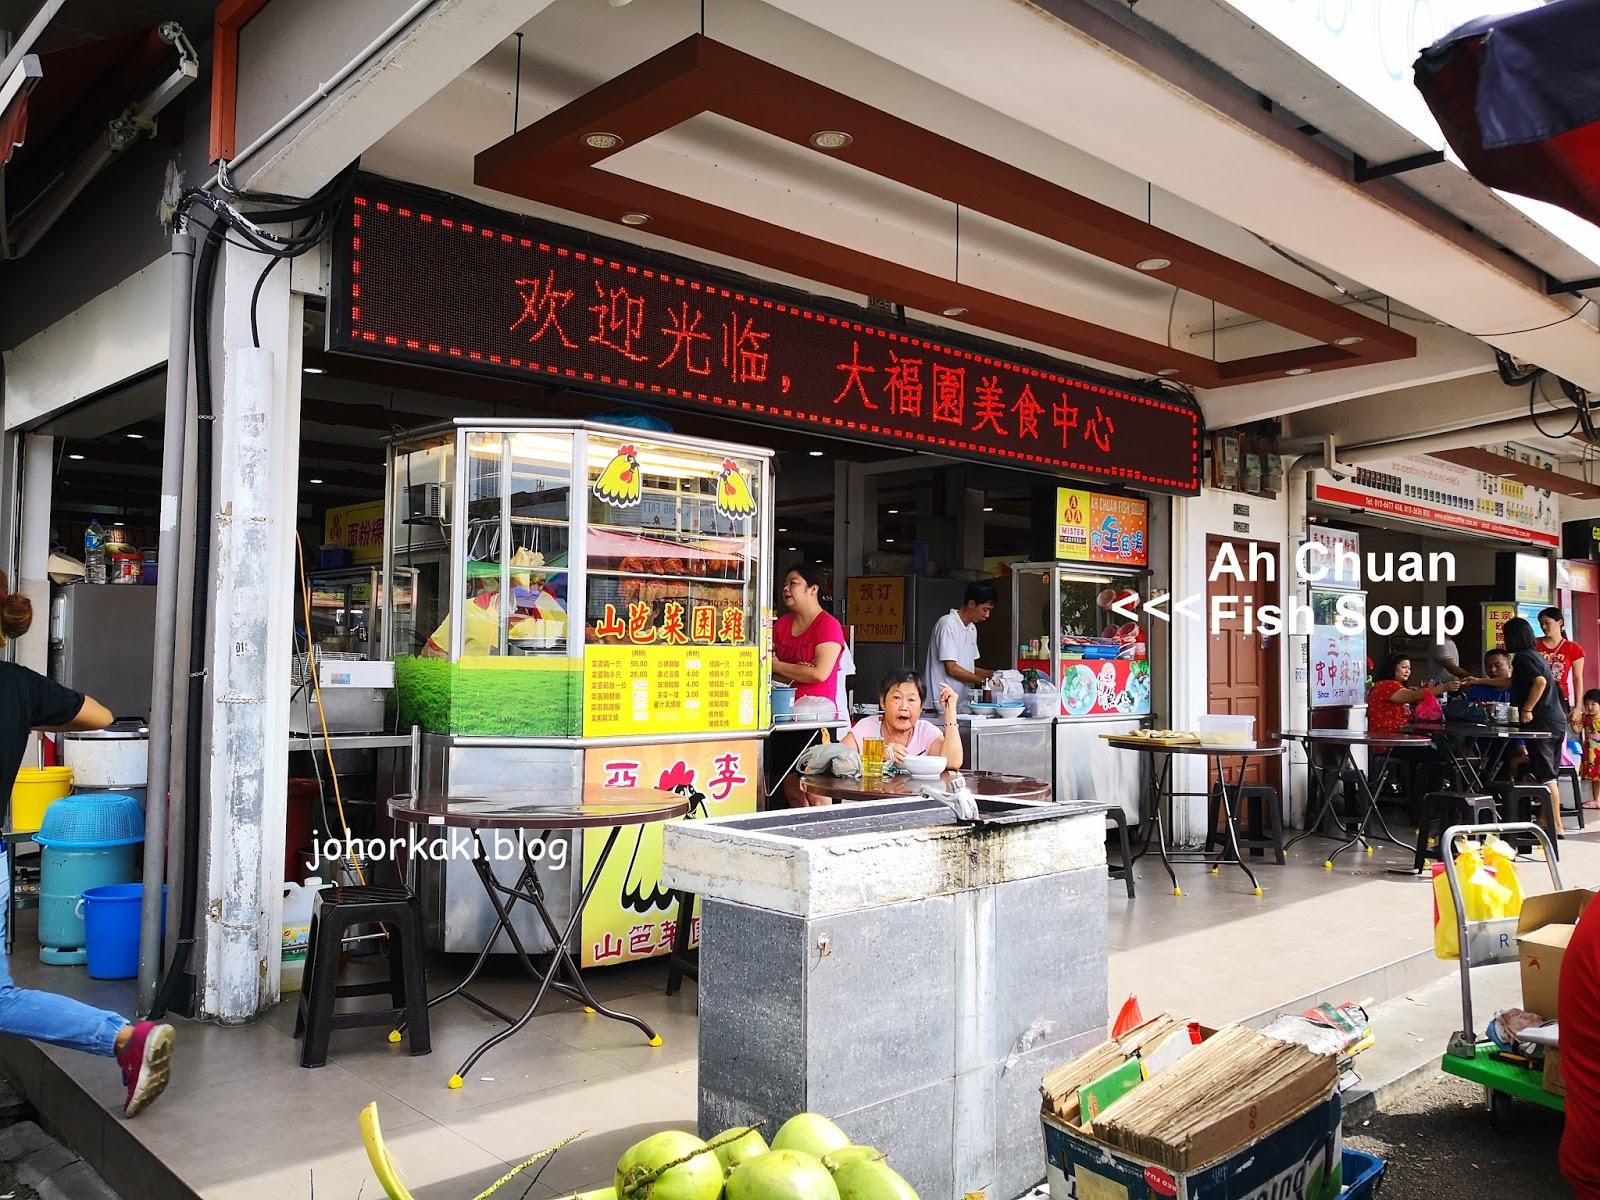 Johor Best Food 097 Countdown 2018 Ah Chuan Fish Soup ɘ¿å…¨é±¼æ¹¯ In Pelangi Johor Kaki Travels For Food